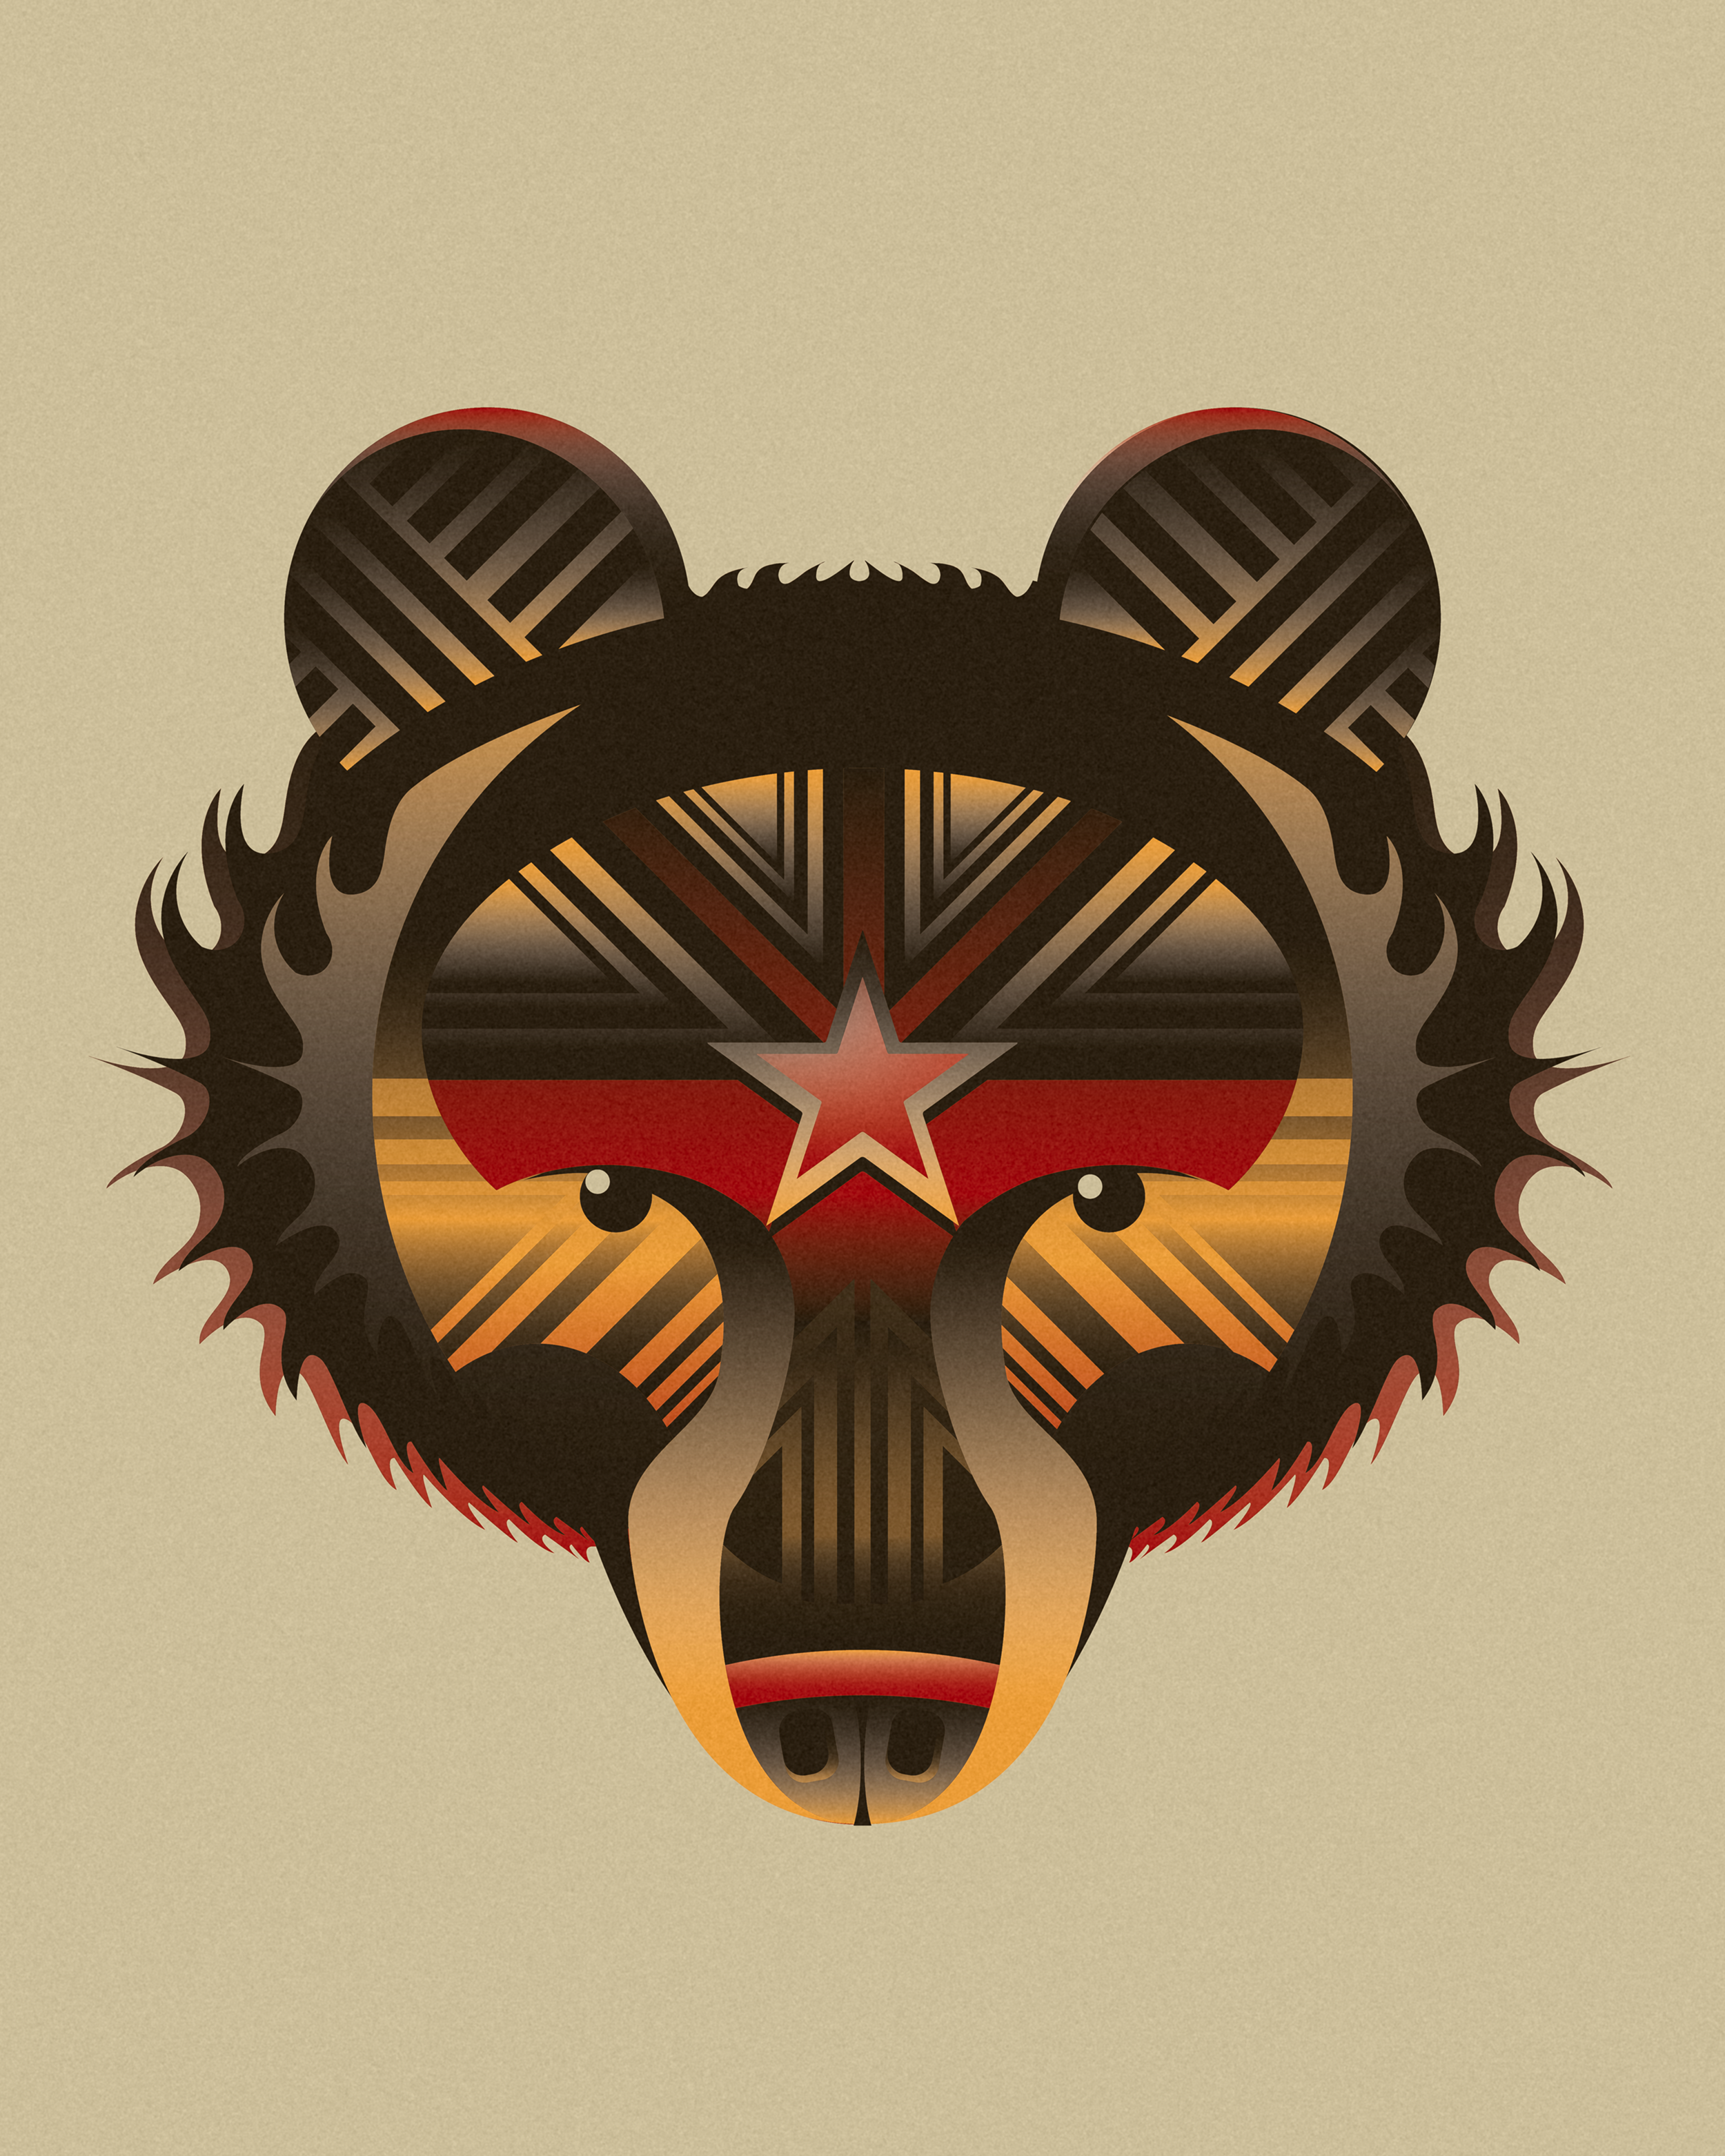 beartexturecompressed1.png